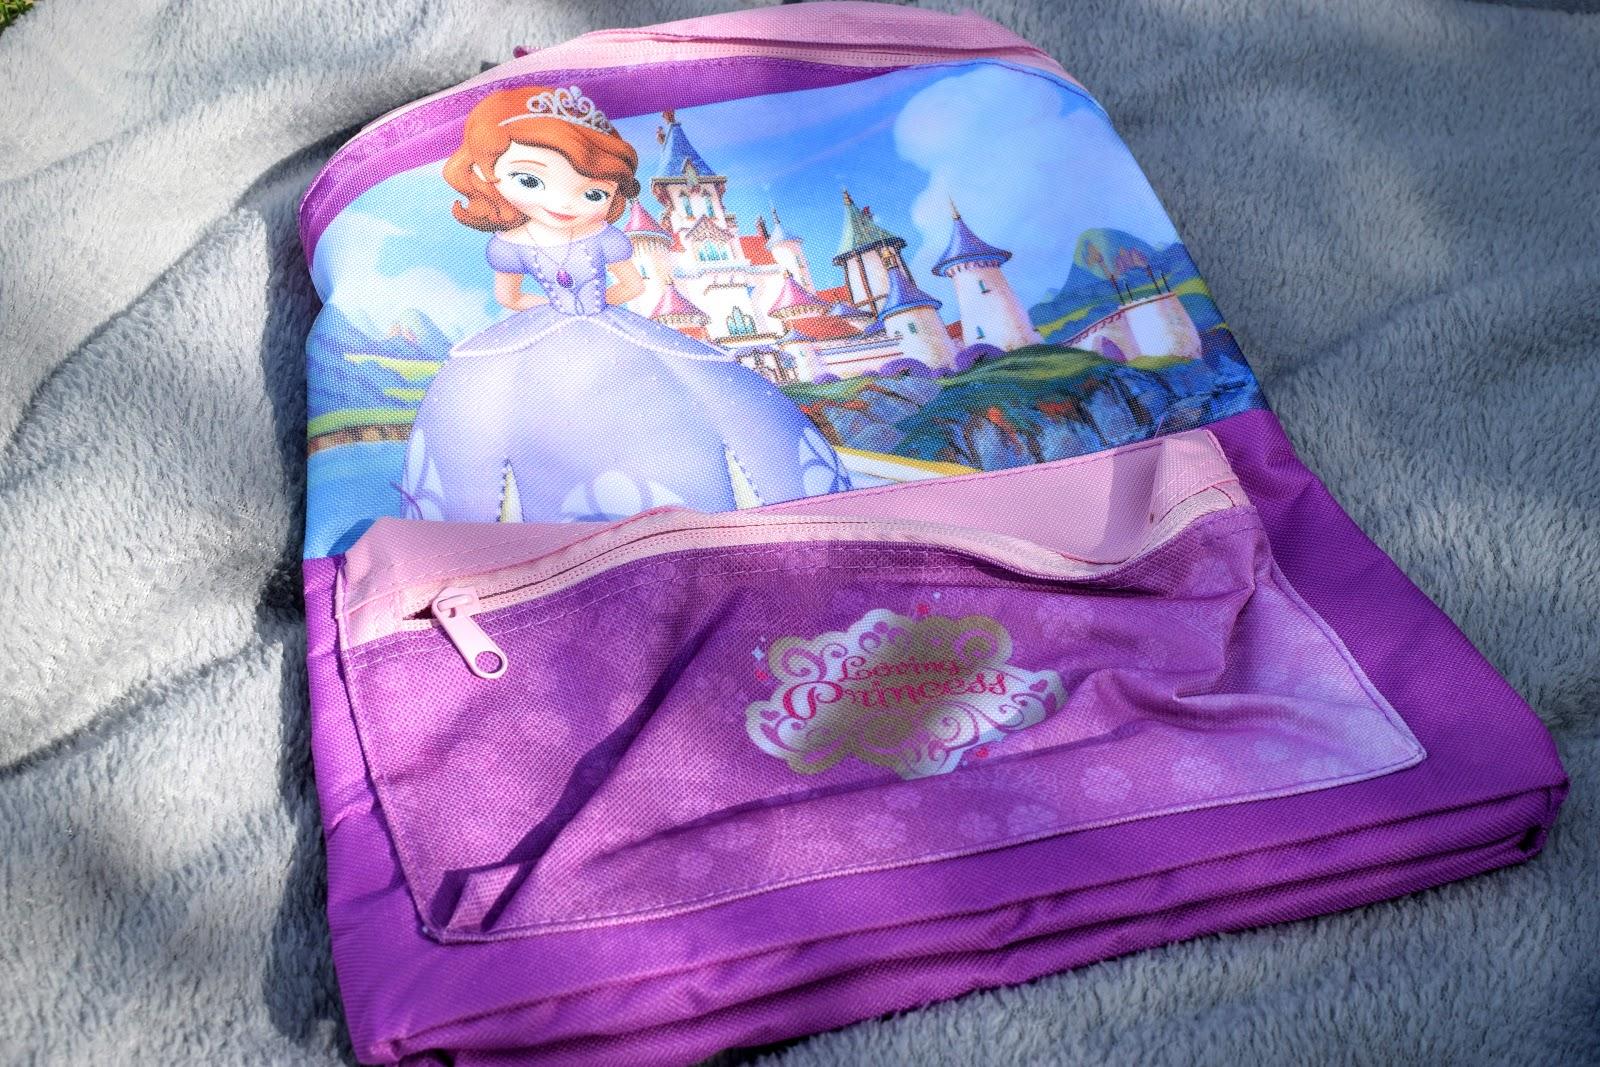 ", Disney Junior ""Princess Sofia the First"" New Toy Range #review"